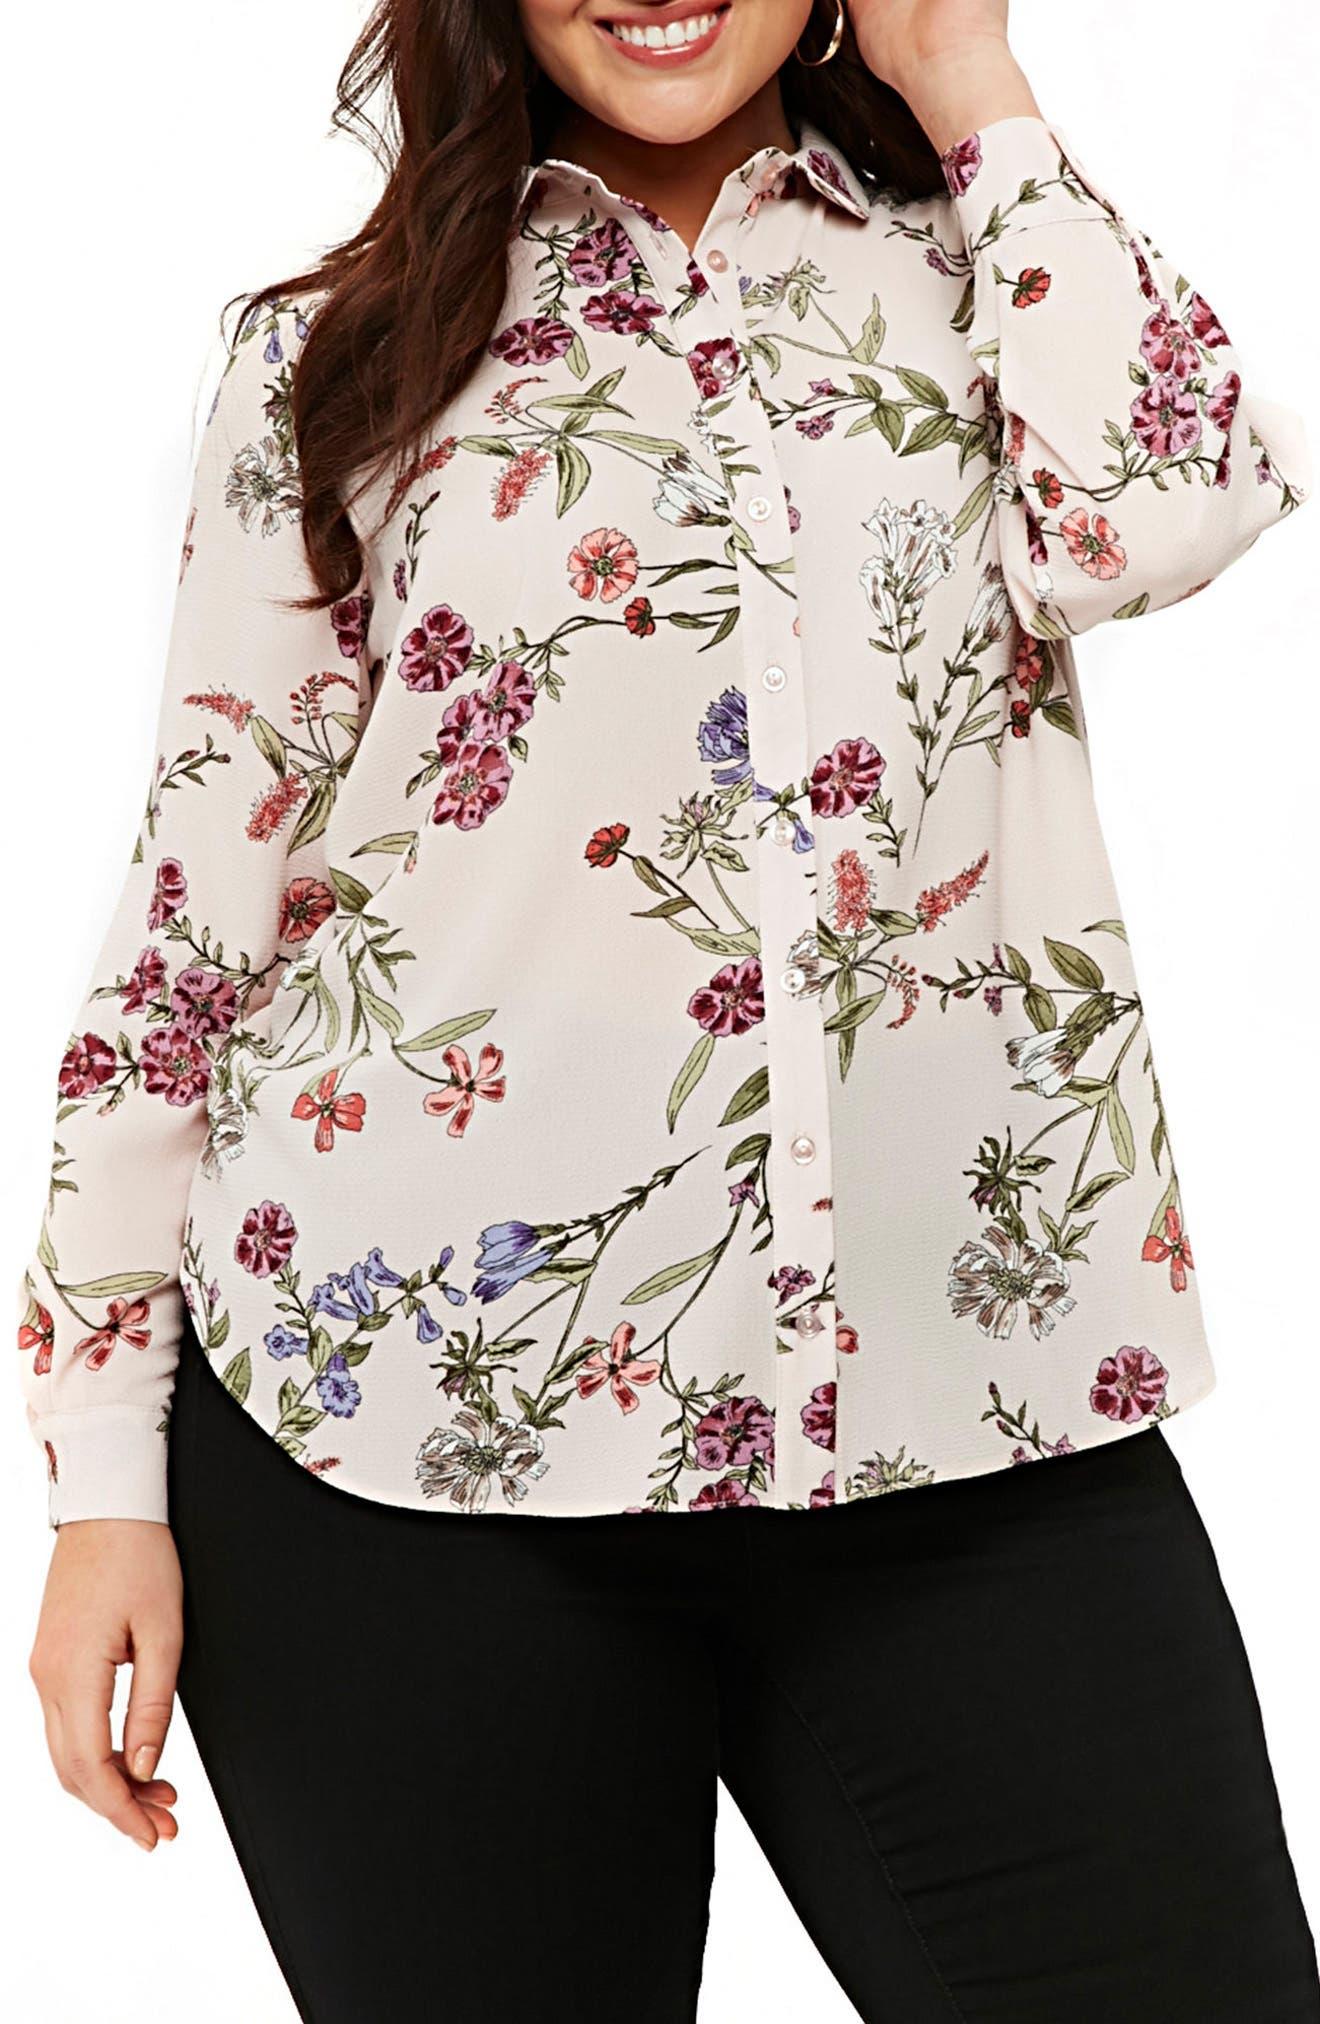 Blush Floral Print Shirt,                             Main thumbnail 1, color,                             DARK MULTI